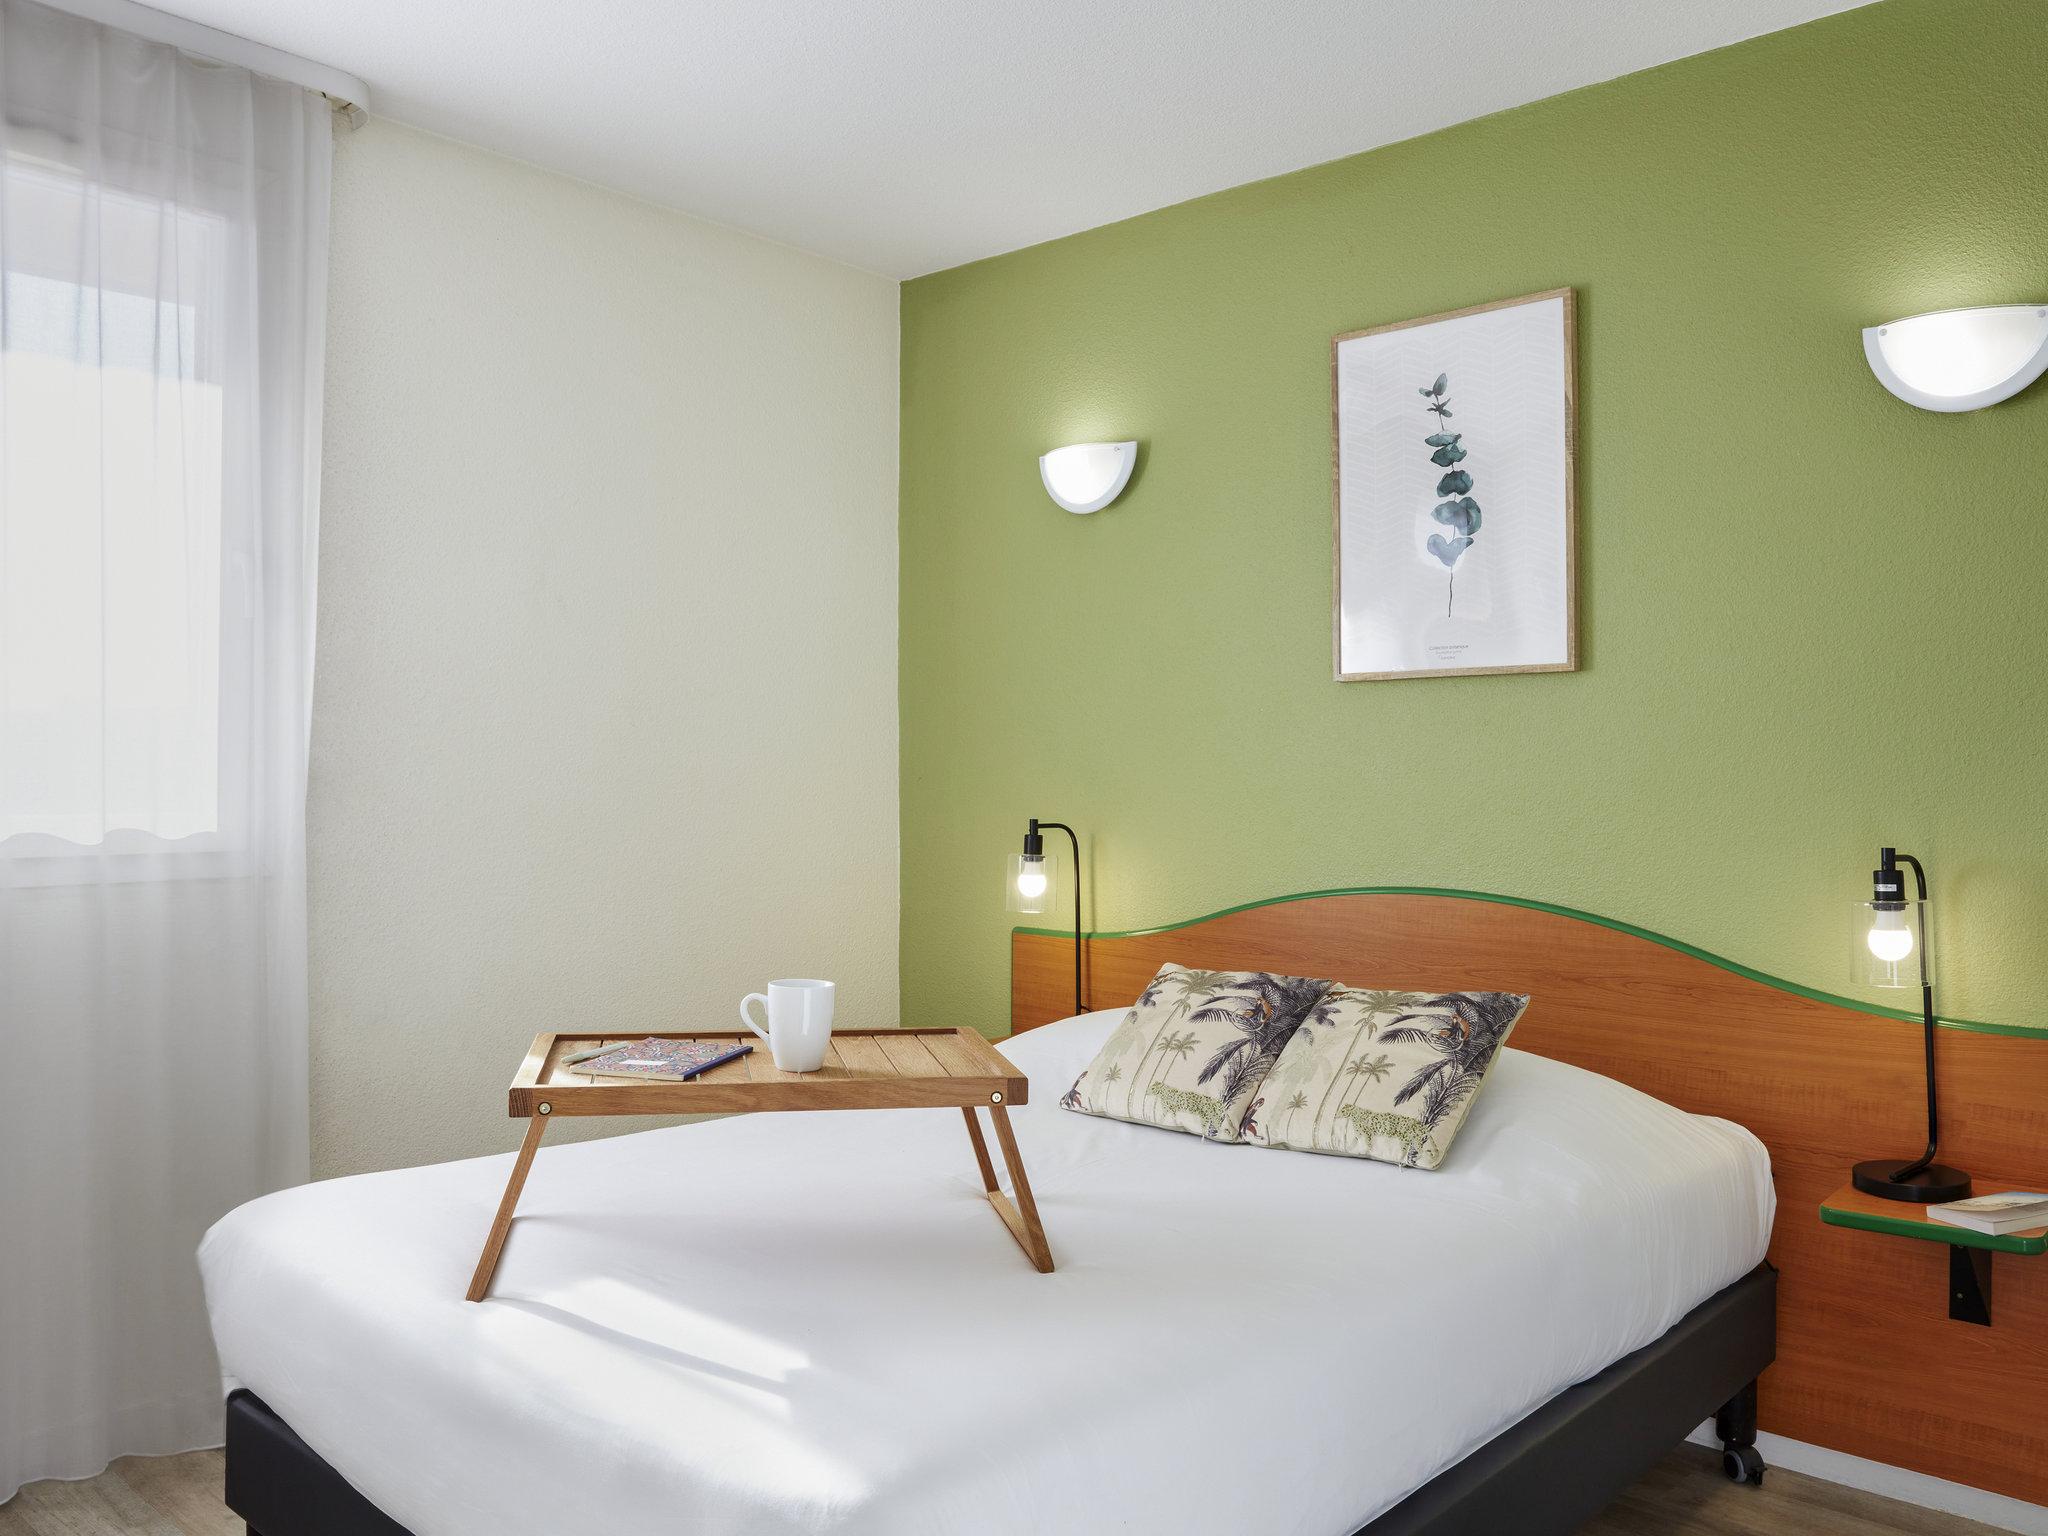 Отель — Adagio Access Бордо Родесс